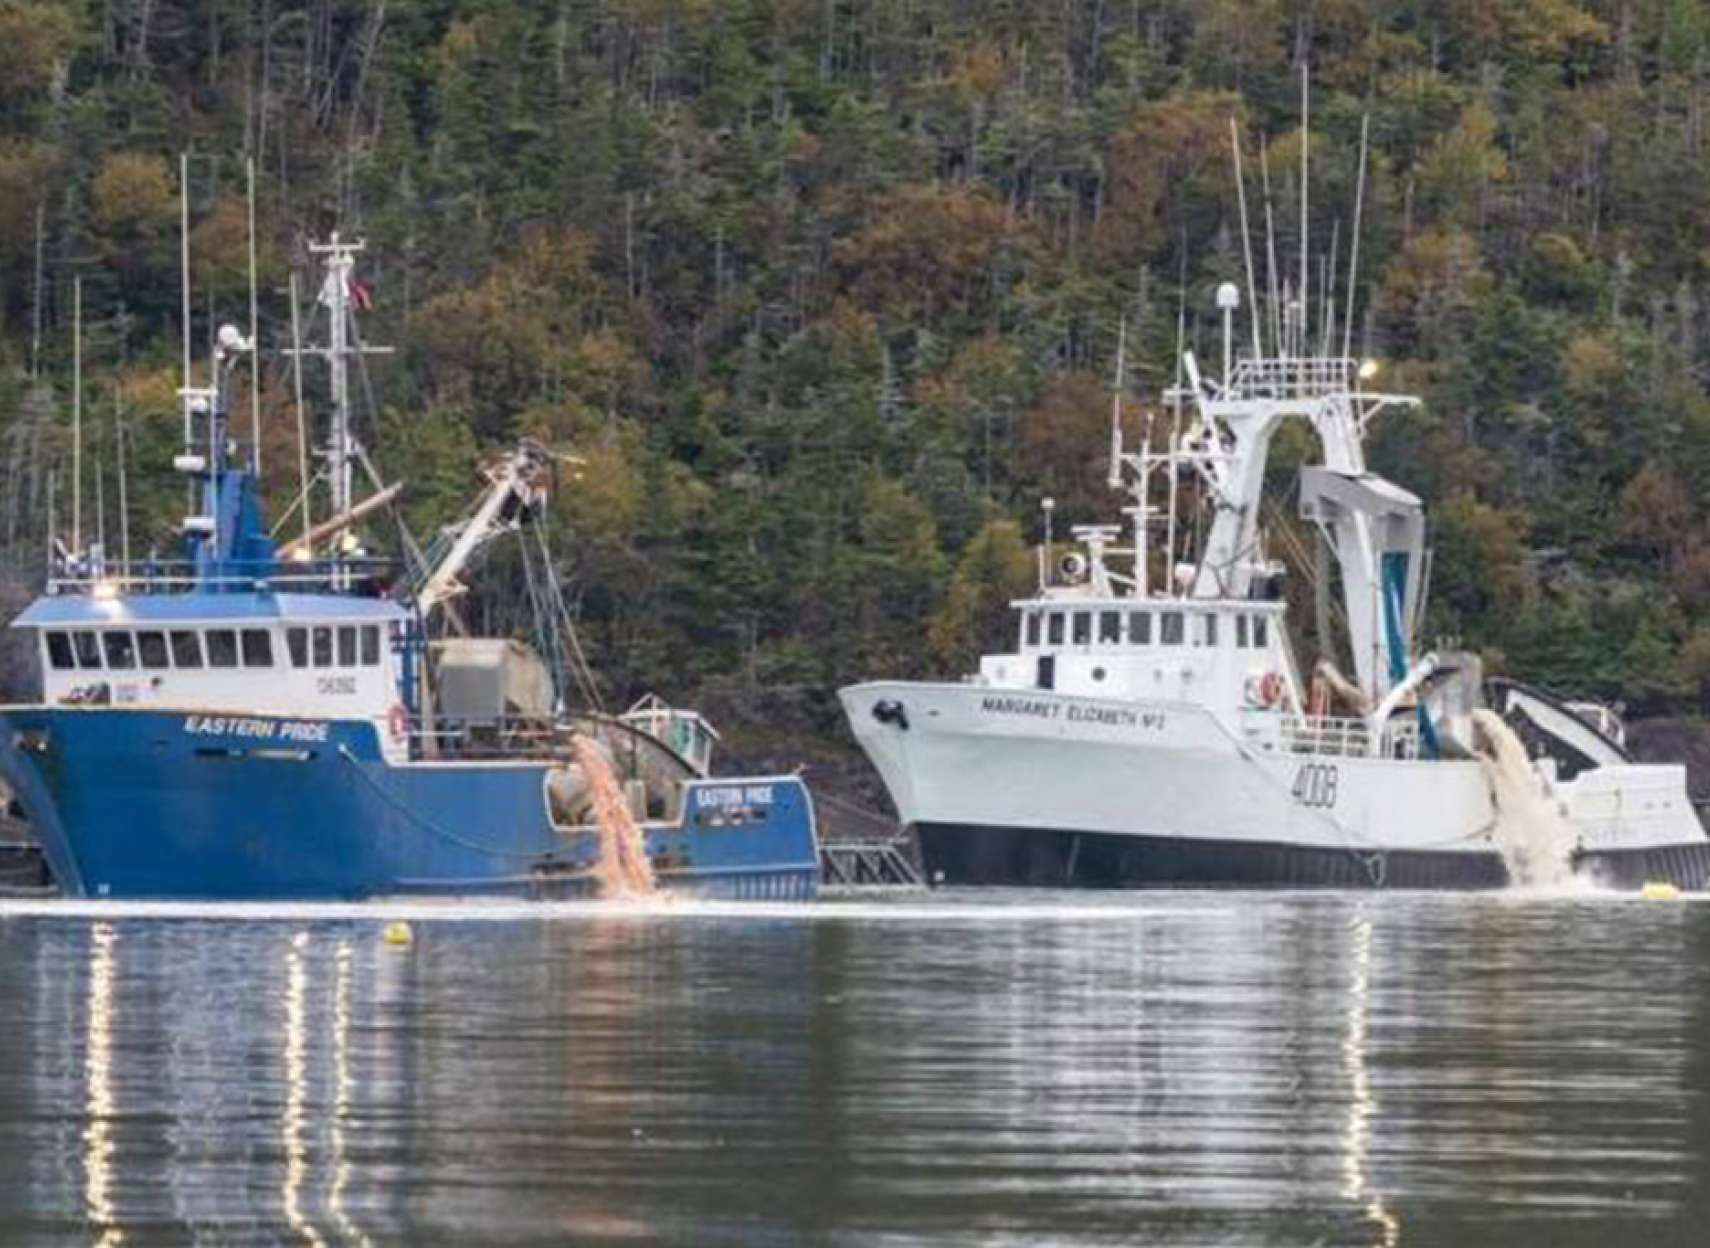 اخبار-کانادا-دو-و-نیم-میلیون-ماهی-در-شرق-کانادا-مُردند